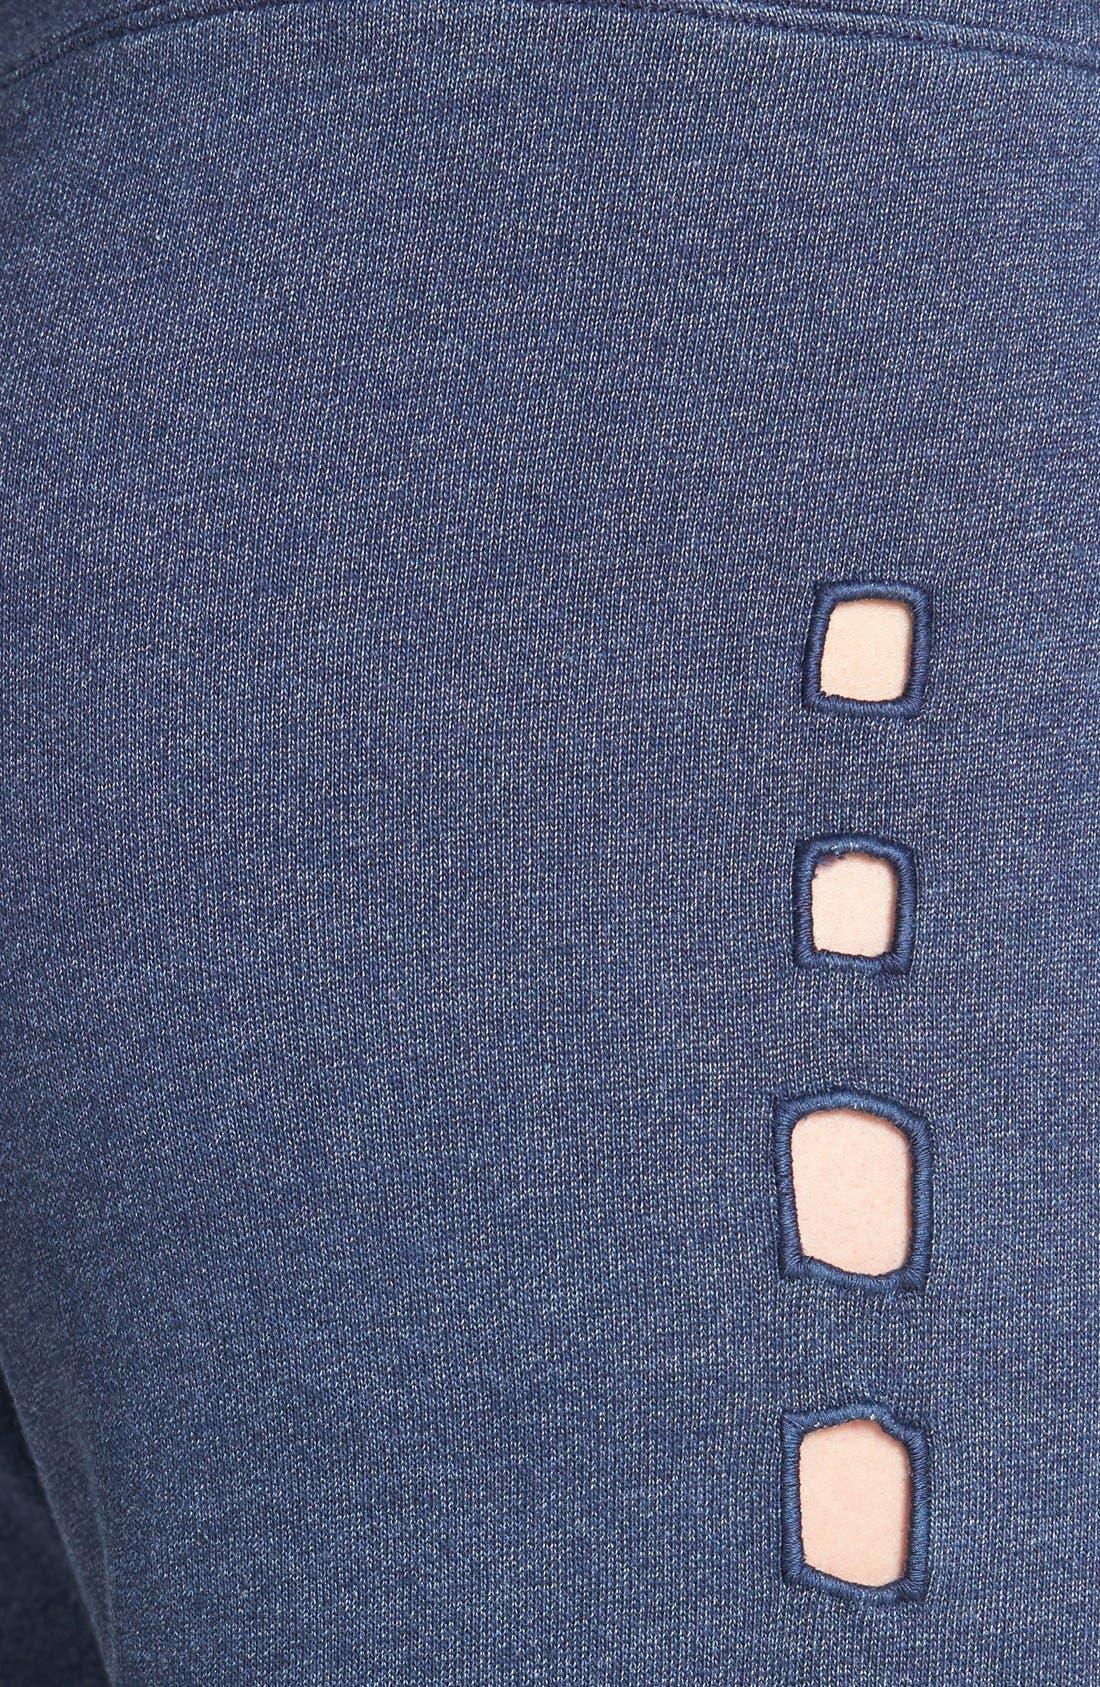 Alternate Image 3  - Monrow Cutout Side Vintage Fleece Sweatpants